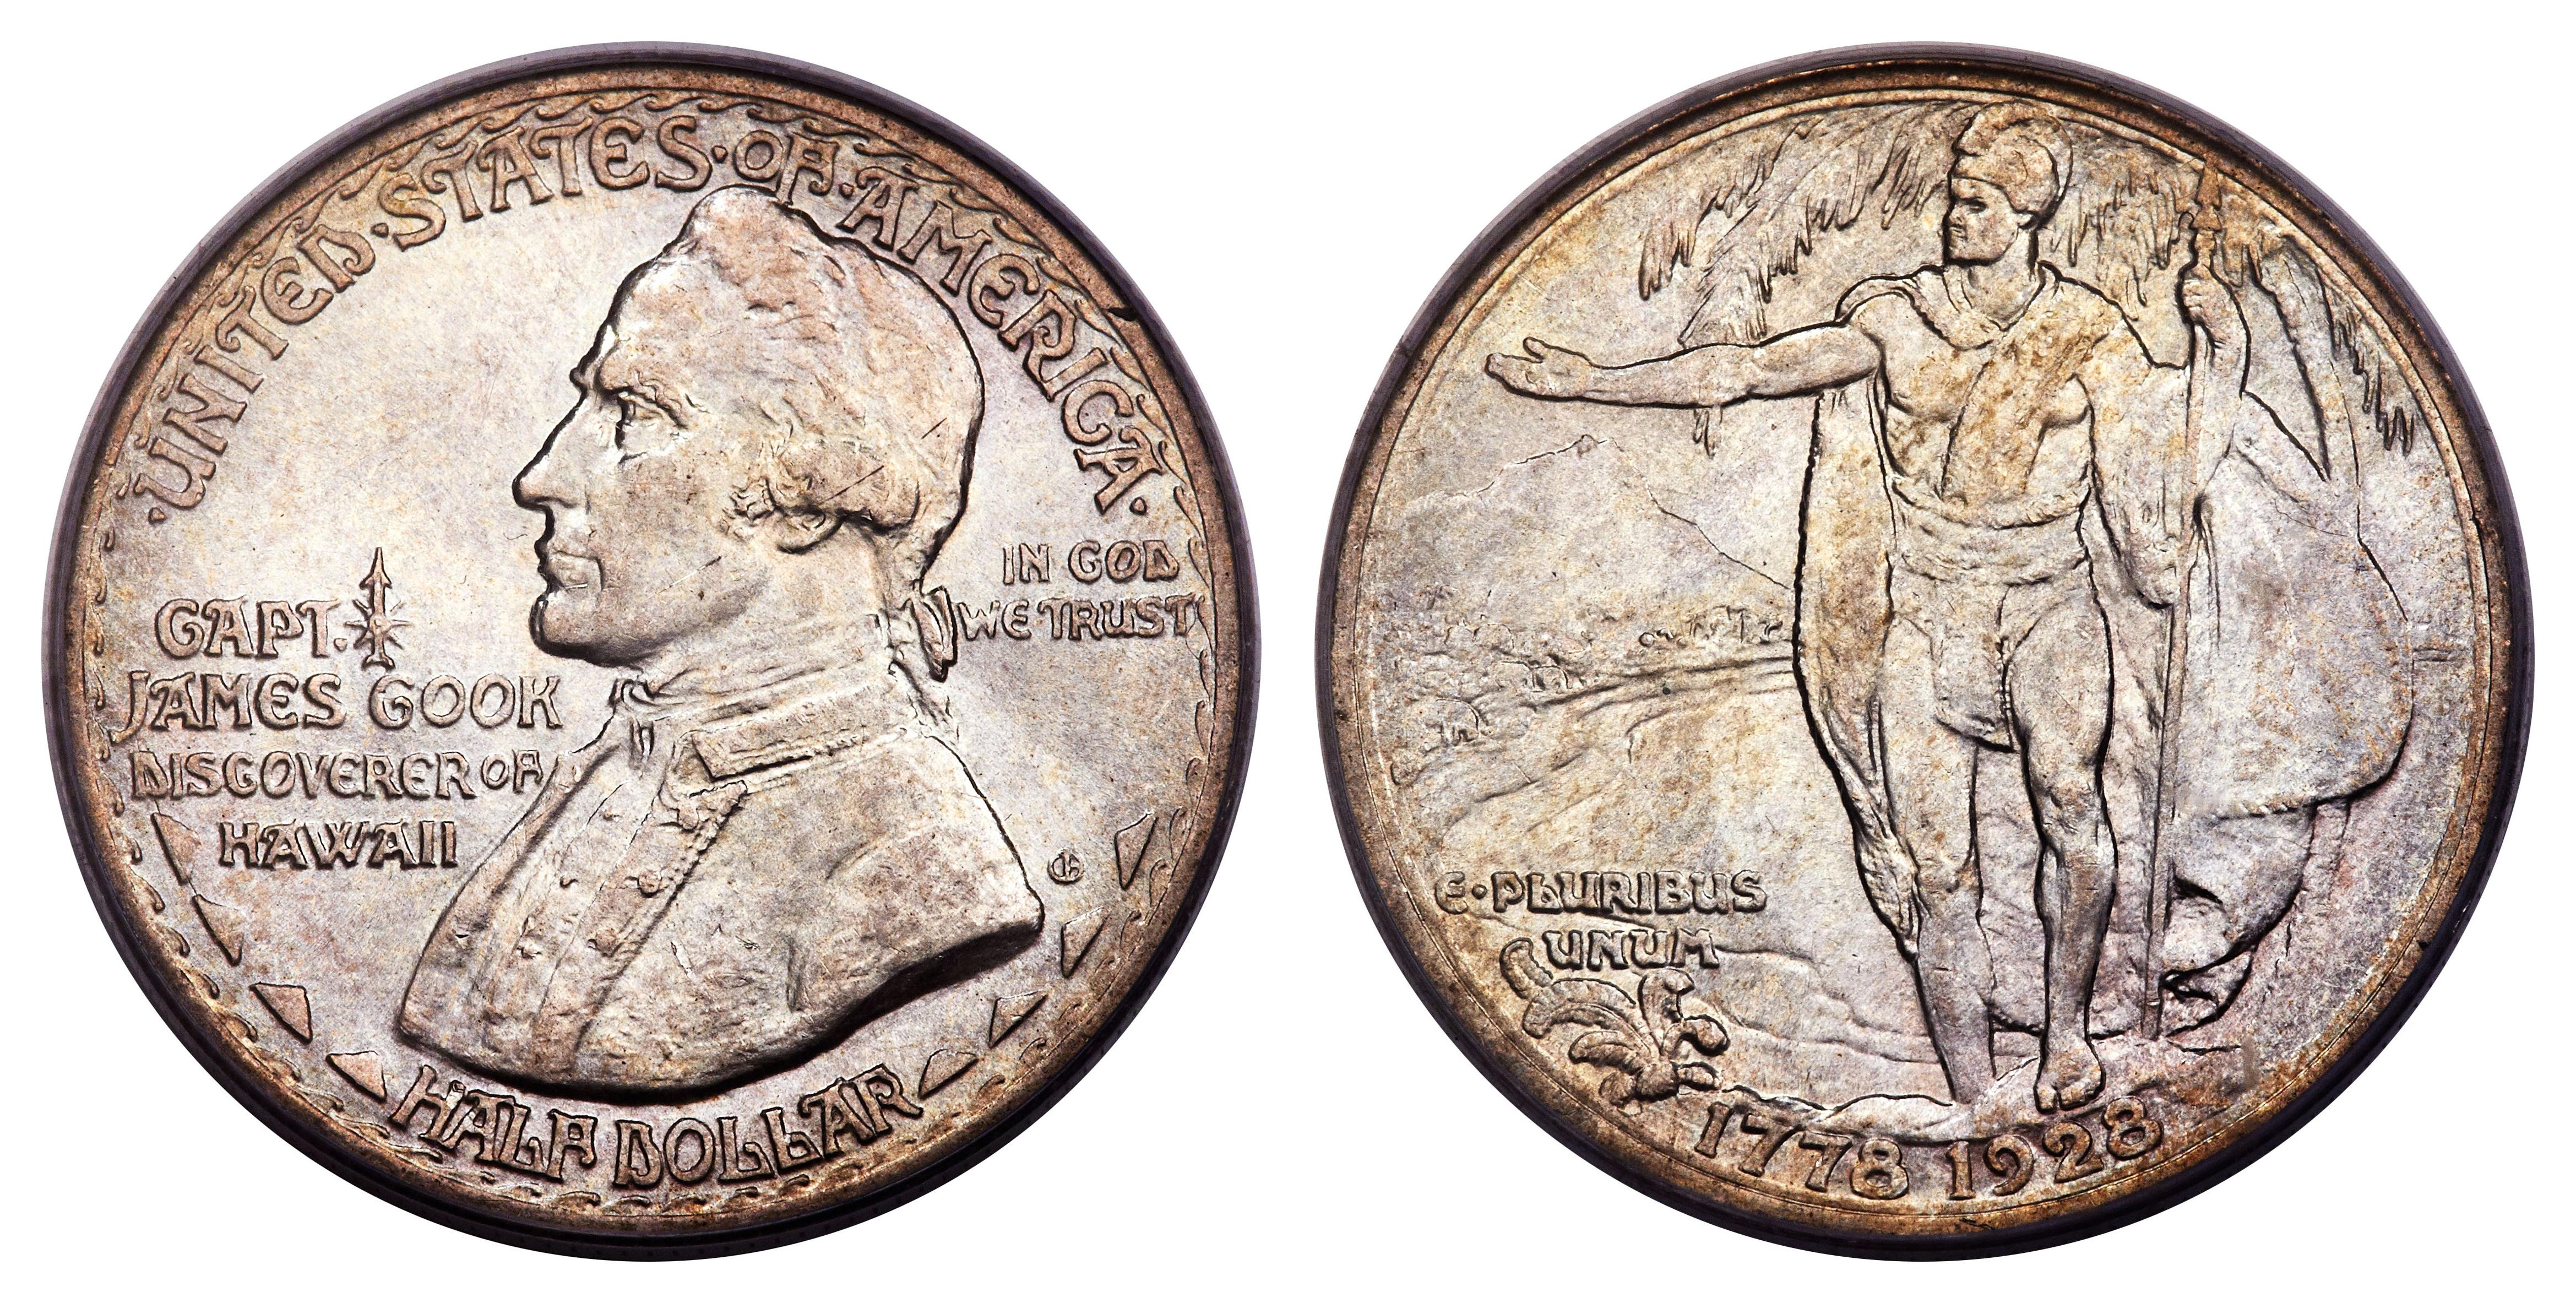 1928 Hawaii Sesquicentennial half-dollar commemorative coin, featuring James Cook.